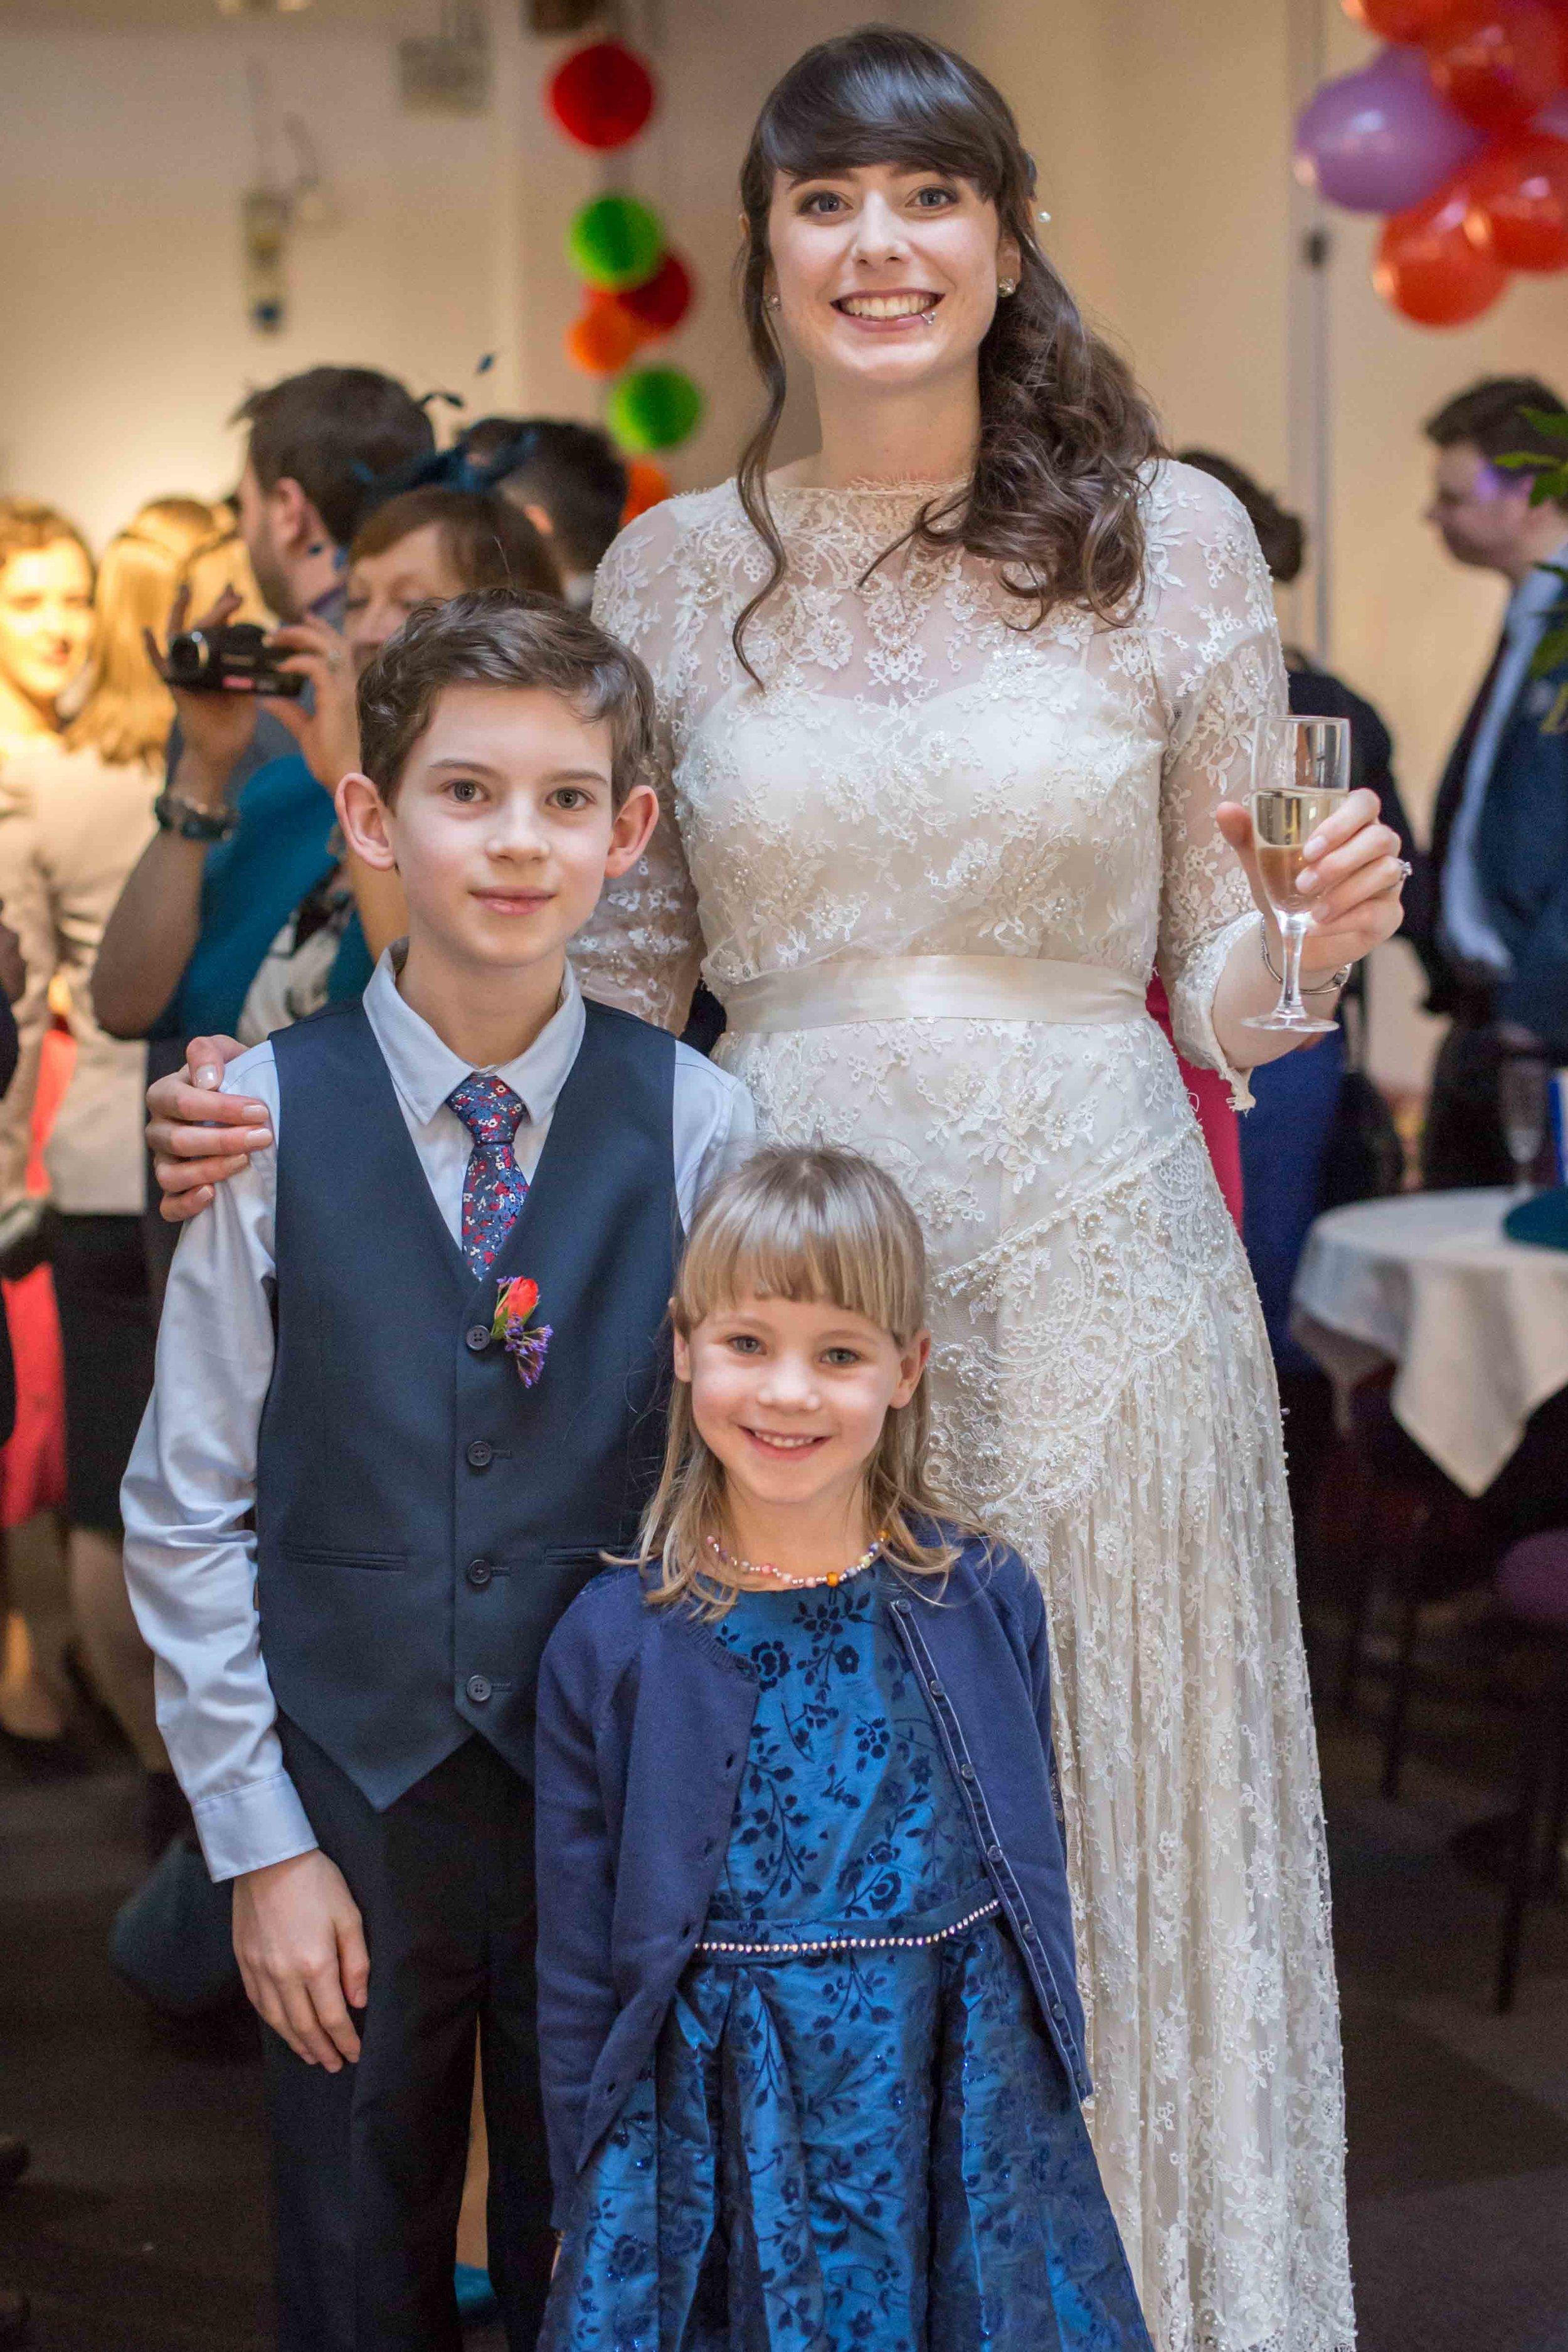 Adam & Faye - Wright Wedding Photography - Bristol Wedding Photographer -178.jpg